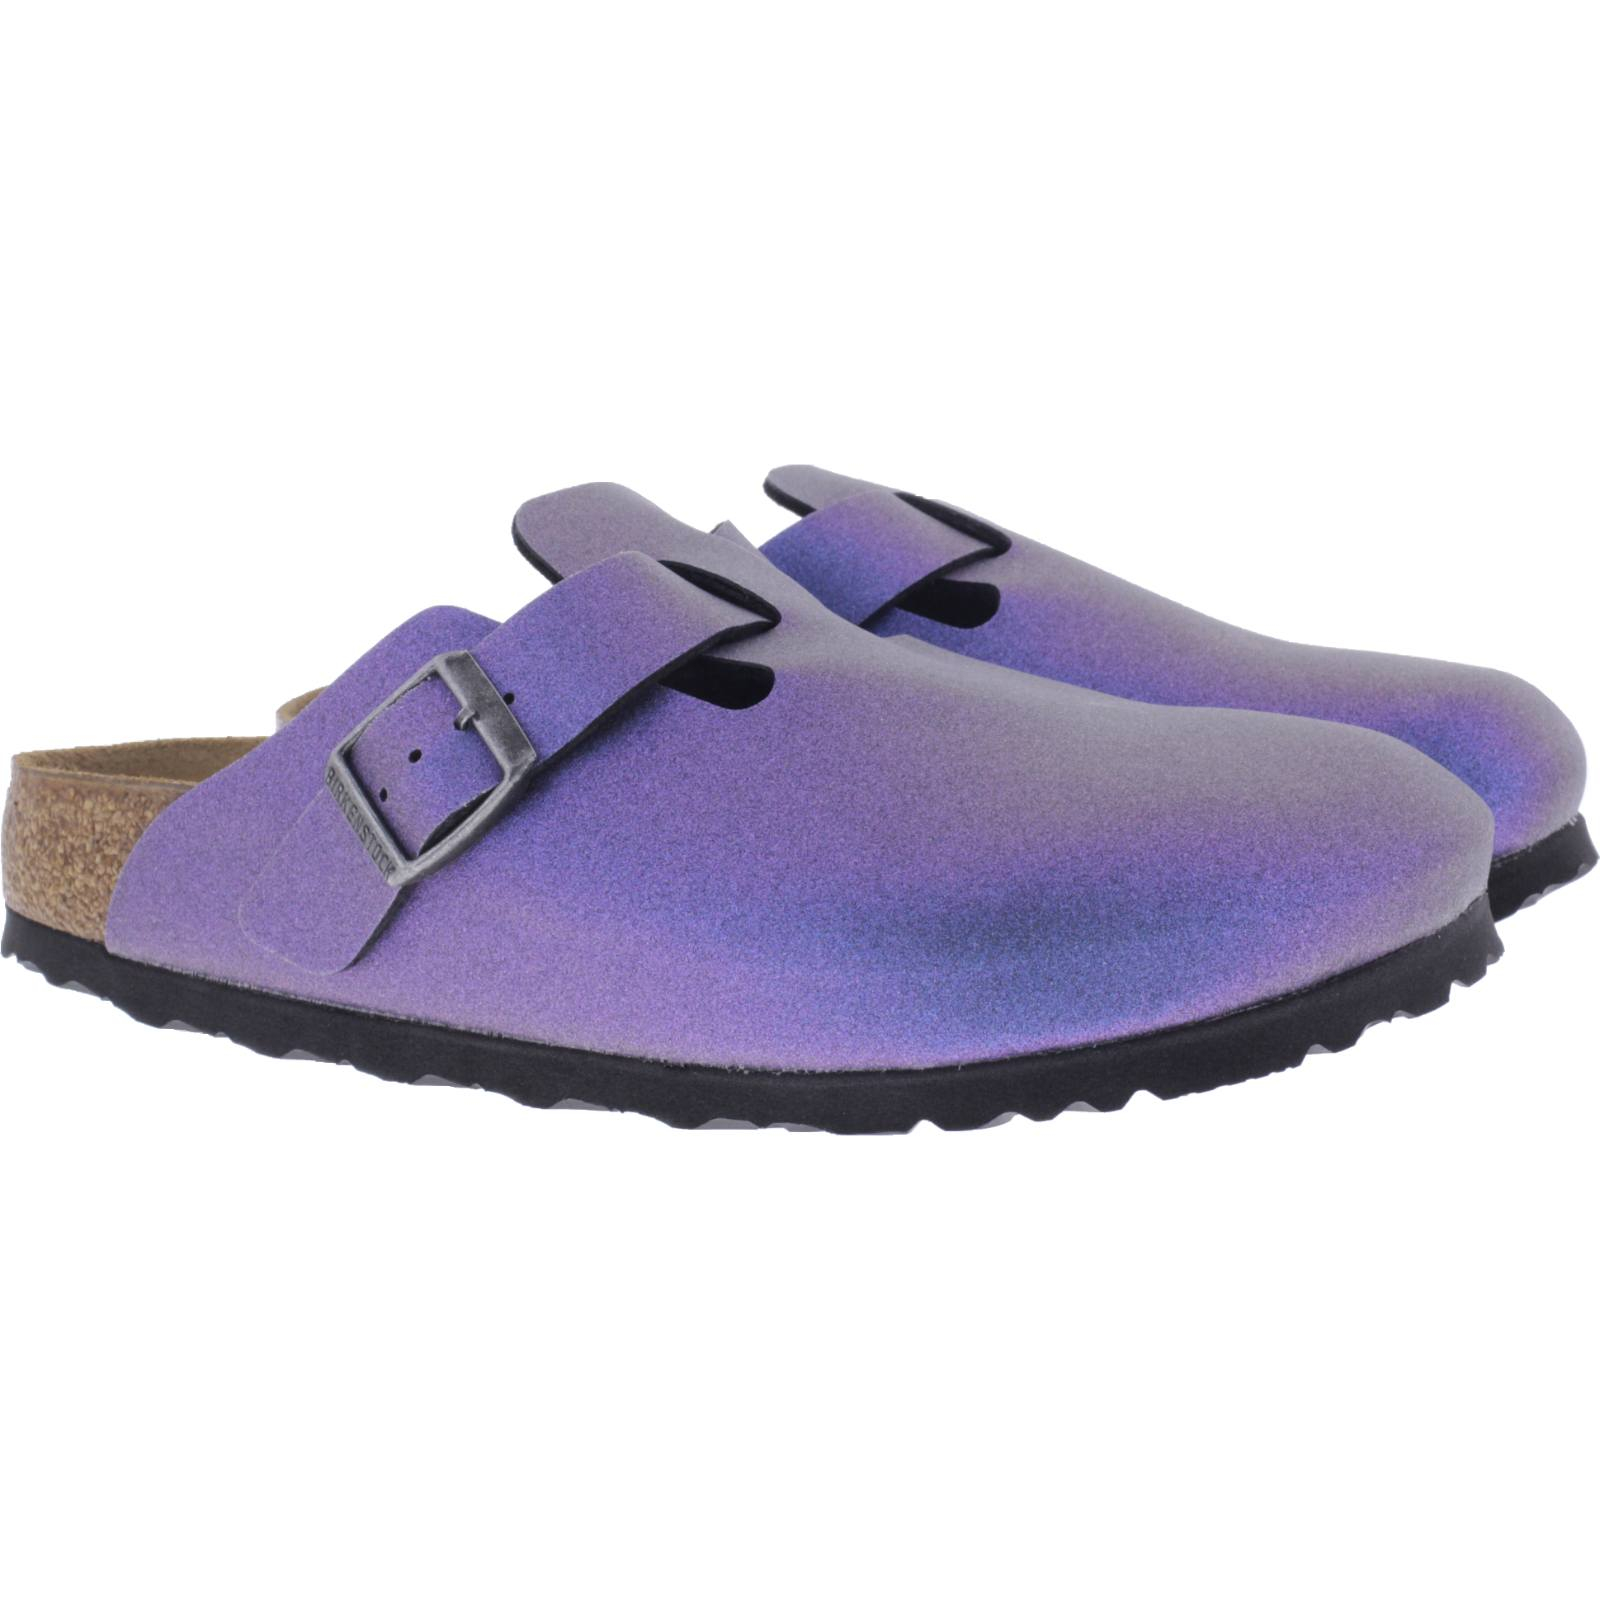 Birkenstock Modell: Boston Icy Metallic Stone Violet Weite: Schmal Art: 1014293 Clogs